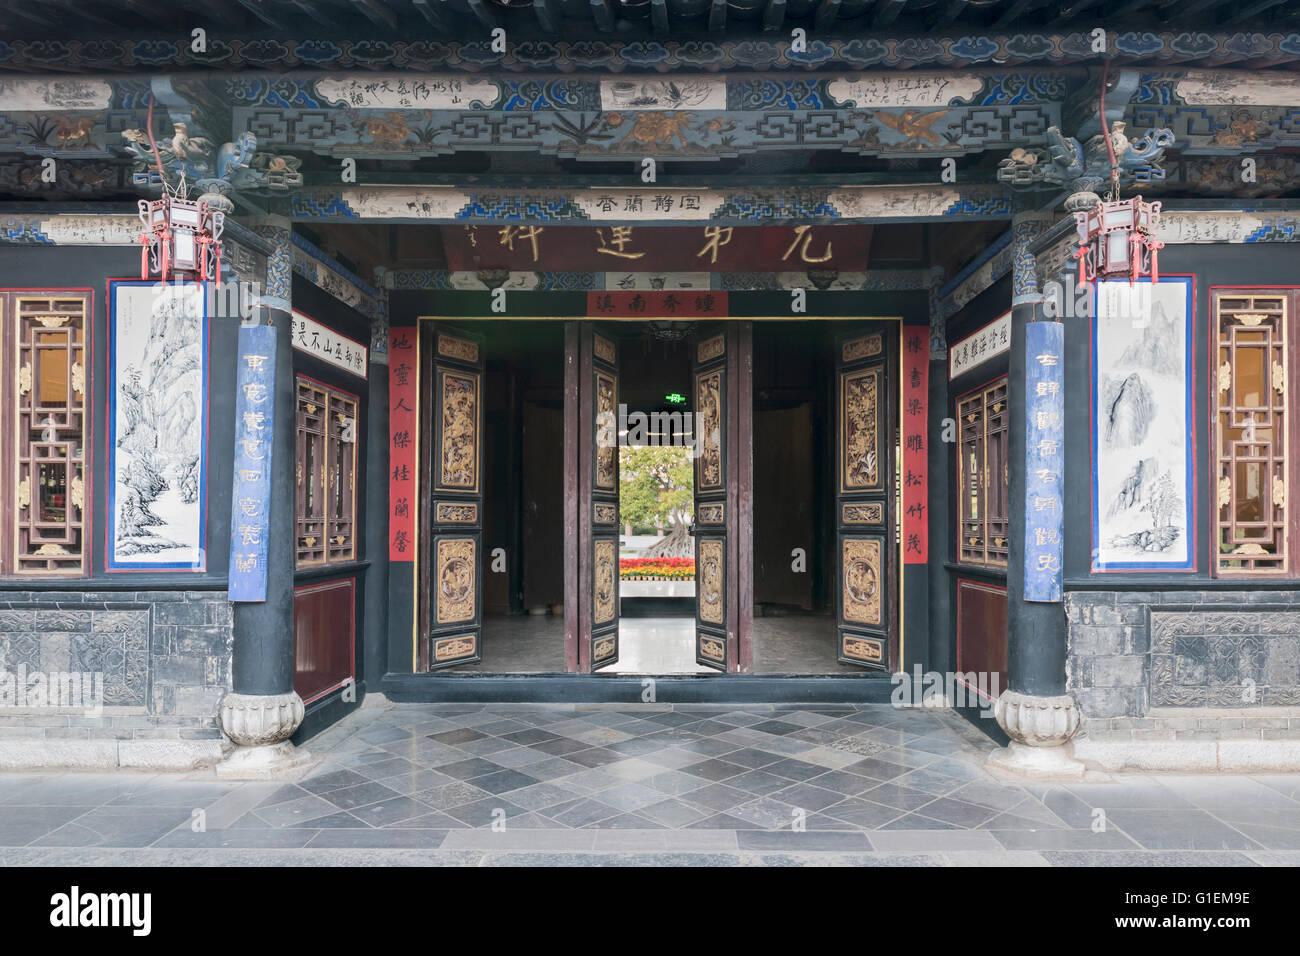 Carved doors and courtyards, Zhu Weiqing house, Jianshui Ancient Town, Yunnan Province, China - Stock Image